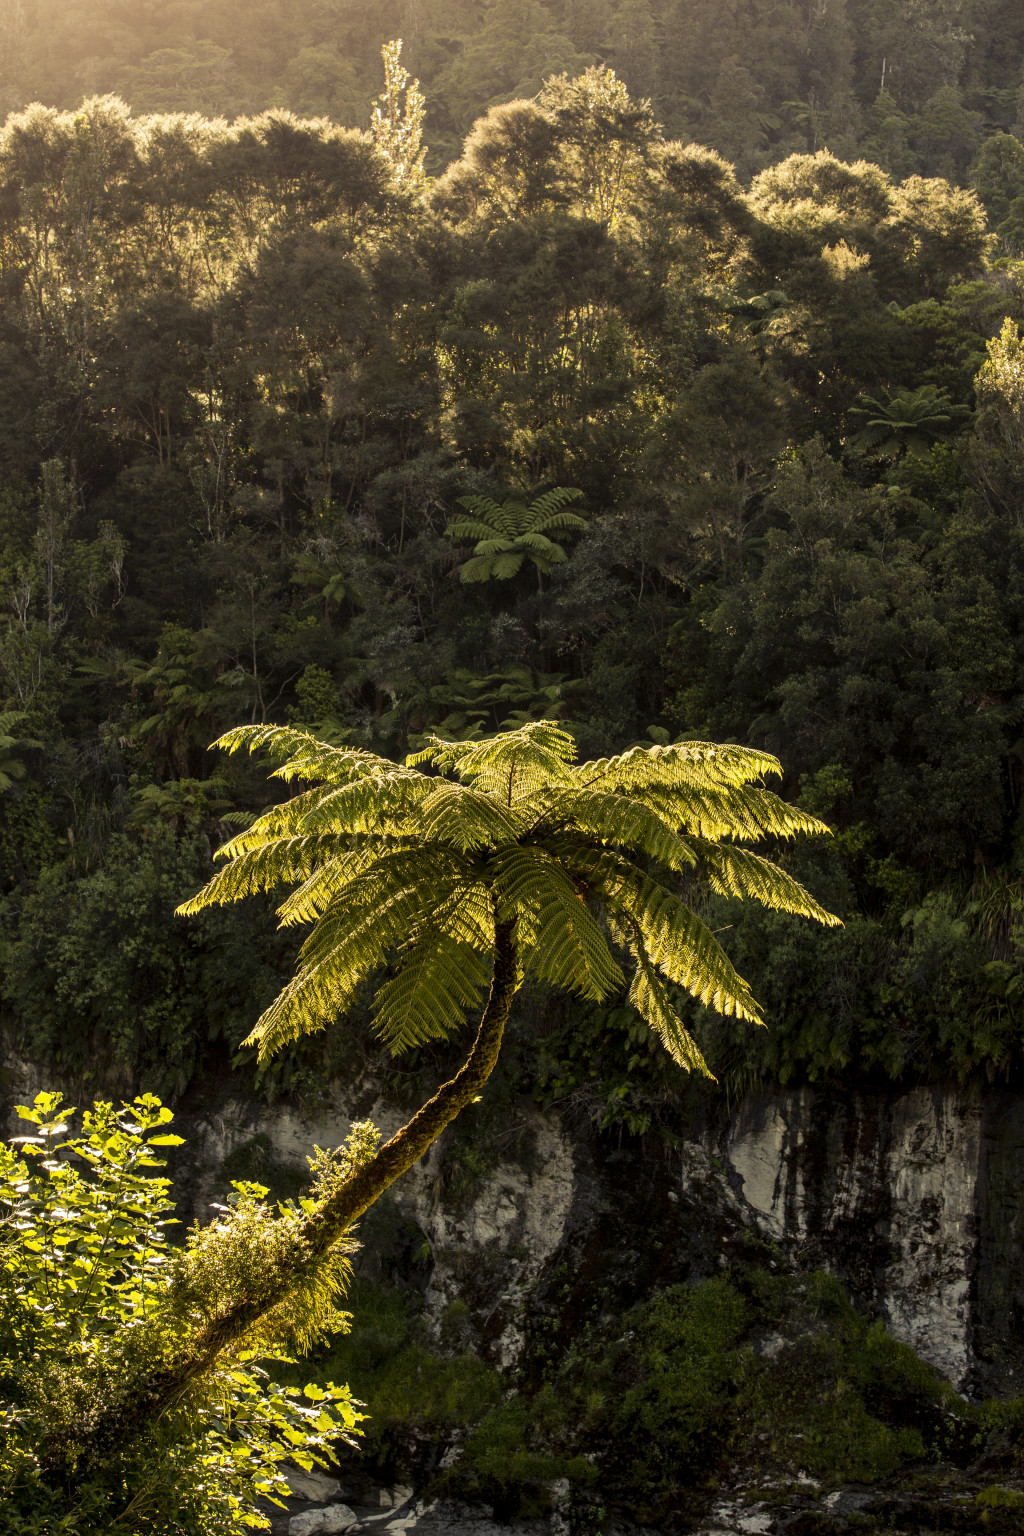 Ausblick vom Zeltplatz Ohauora, Whanganui River, North Island, NZ, Photo: Bernard van Dierendonck